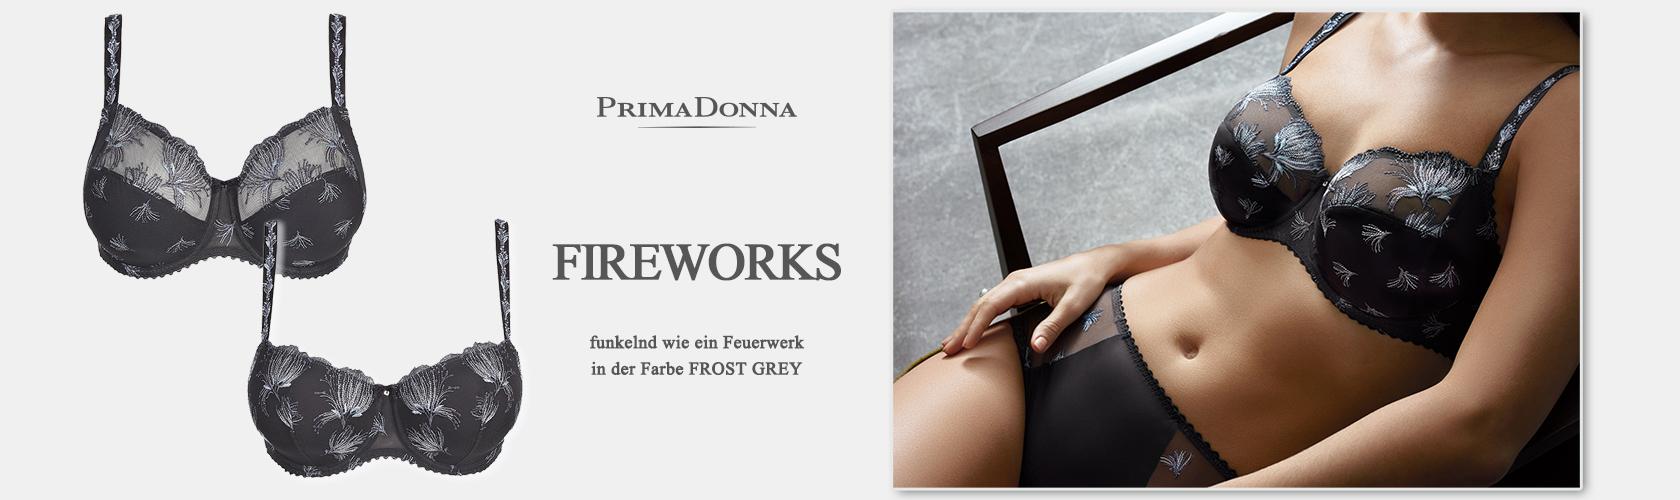 Slideshow FIREWORKS FRO 27.10.